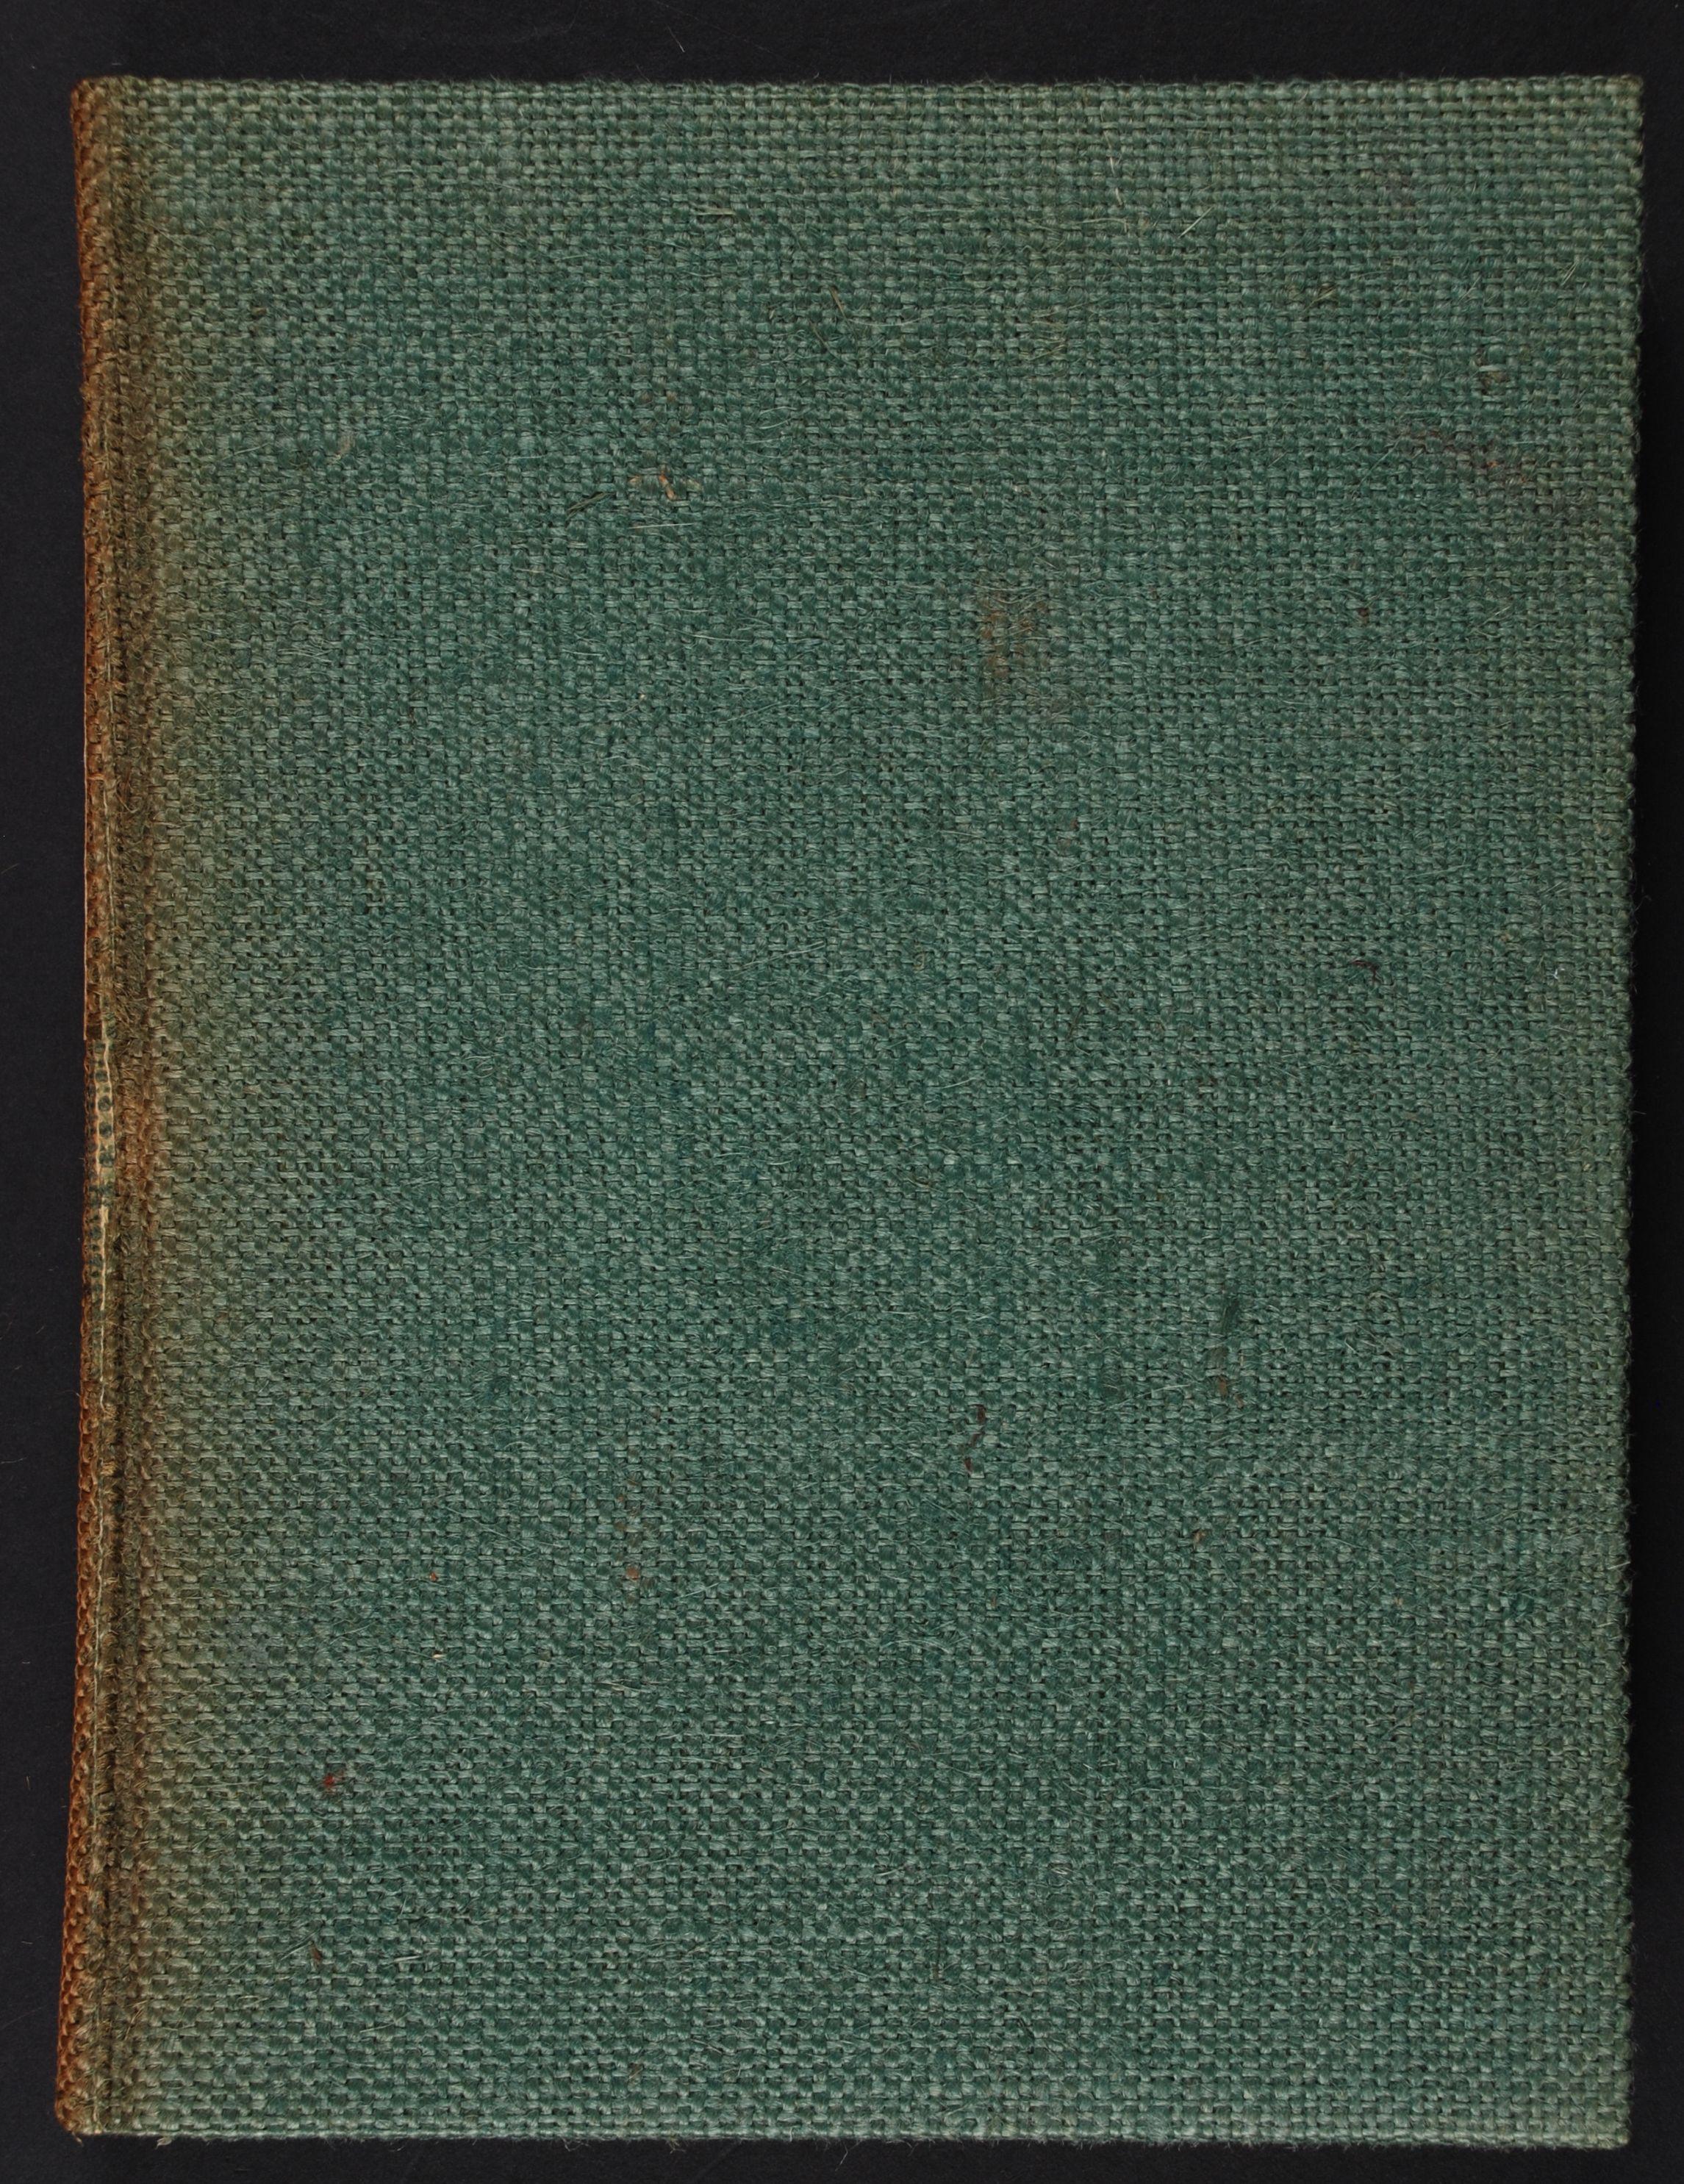 Walt Whitman. Leaves of grass. New York: Doubleday, Doran & Co., 1940.